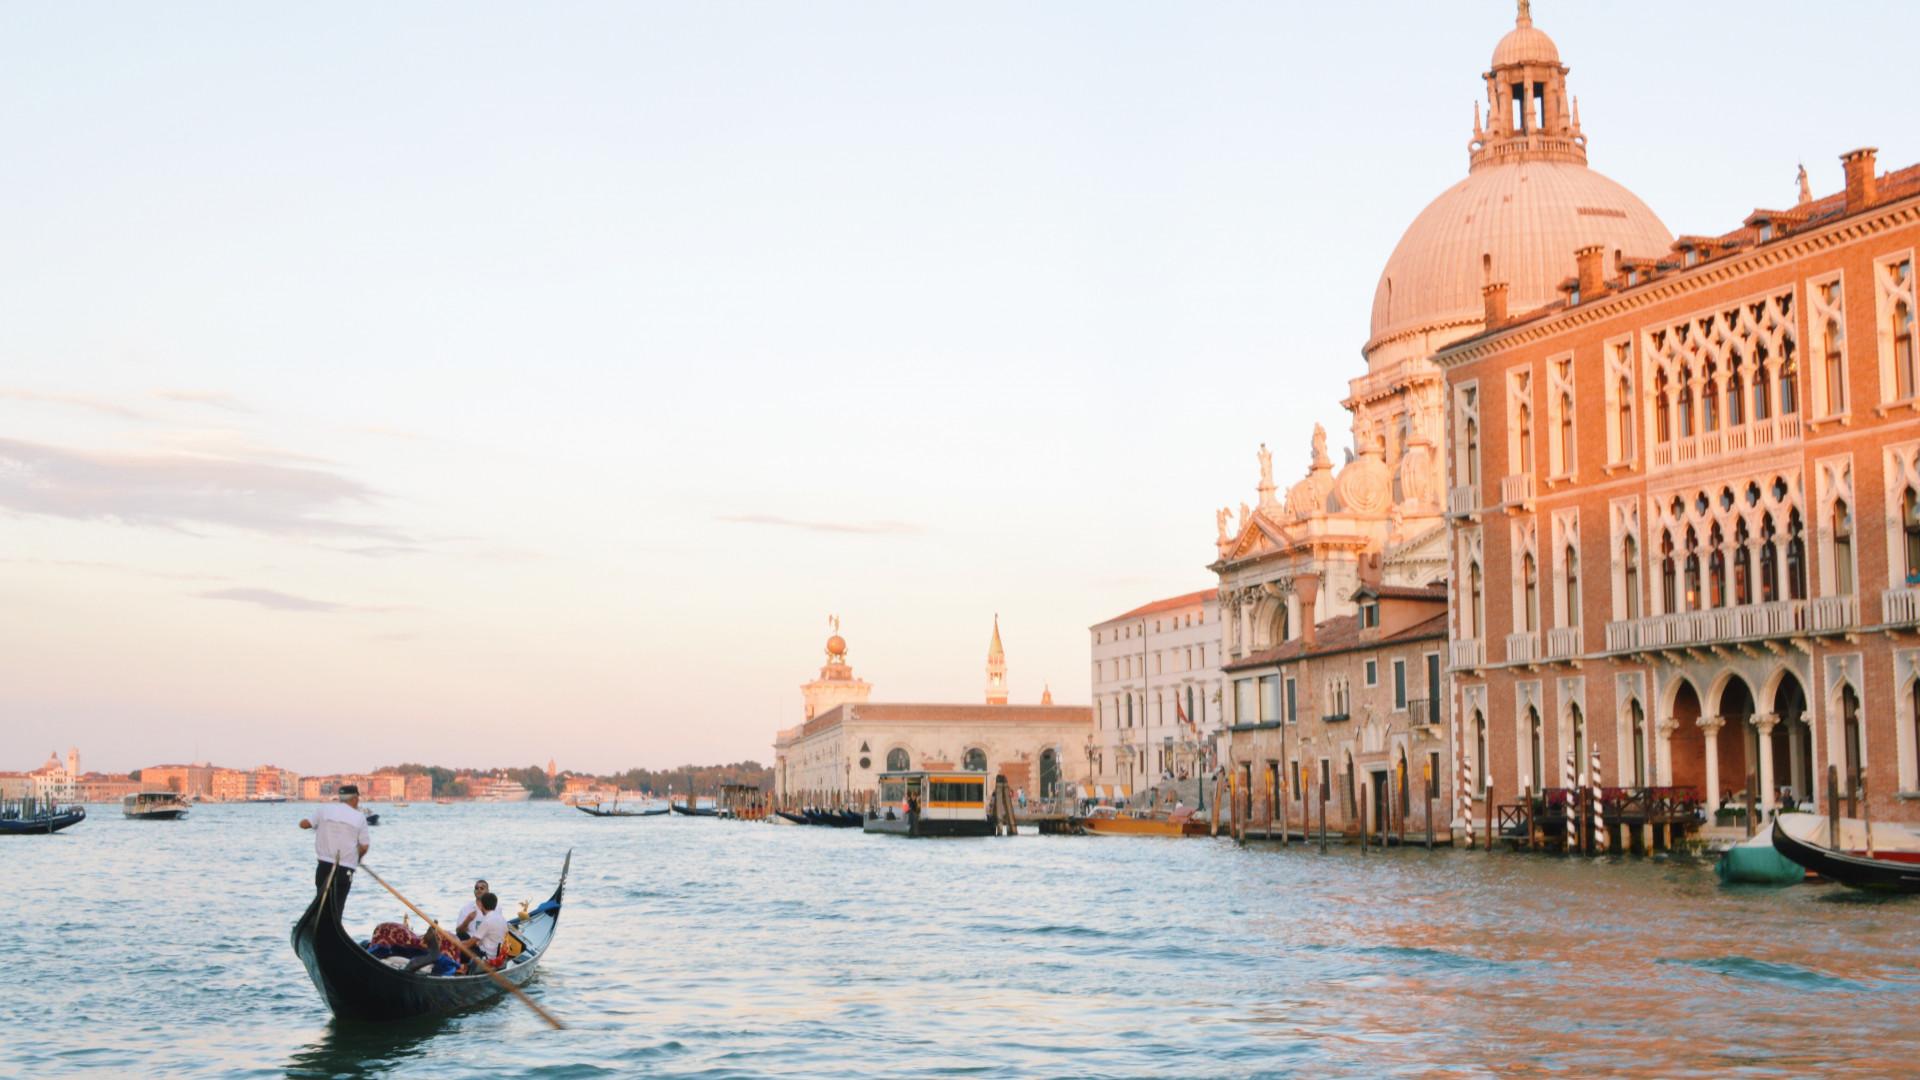 Gondola on Venice's Grand Canal